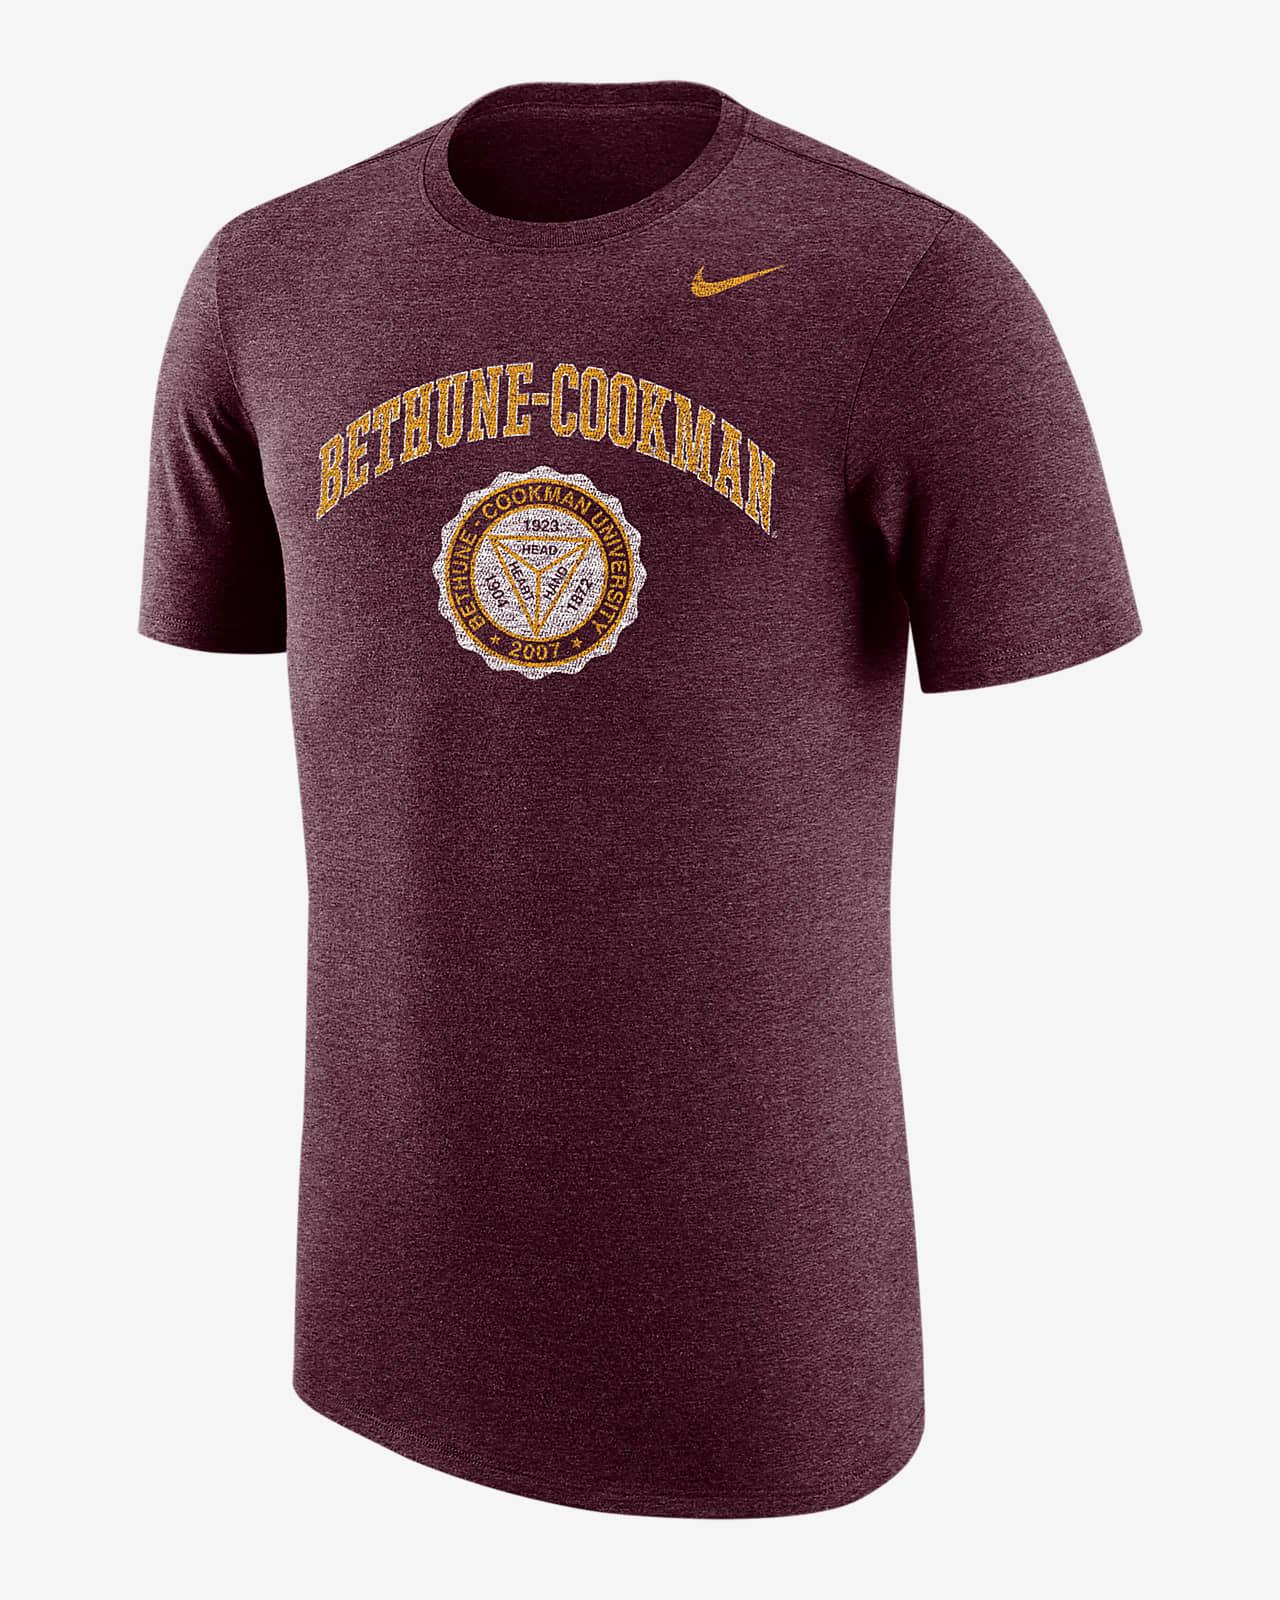 Nike College (Bethune-Cookman) Men's T-Shirt